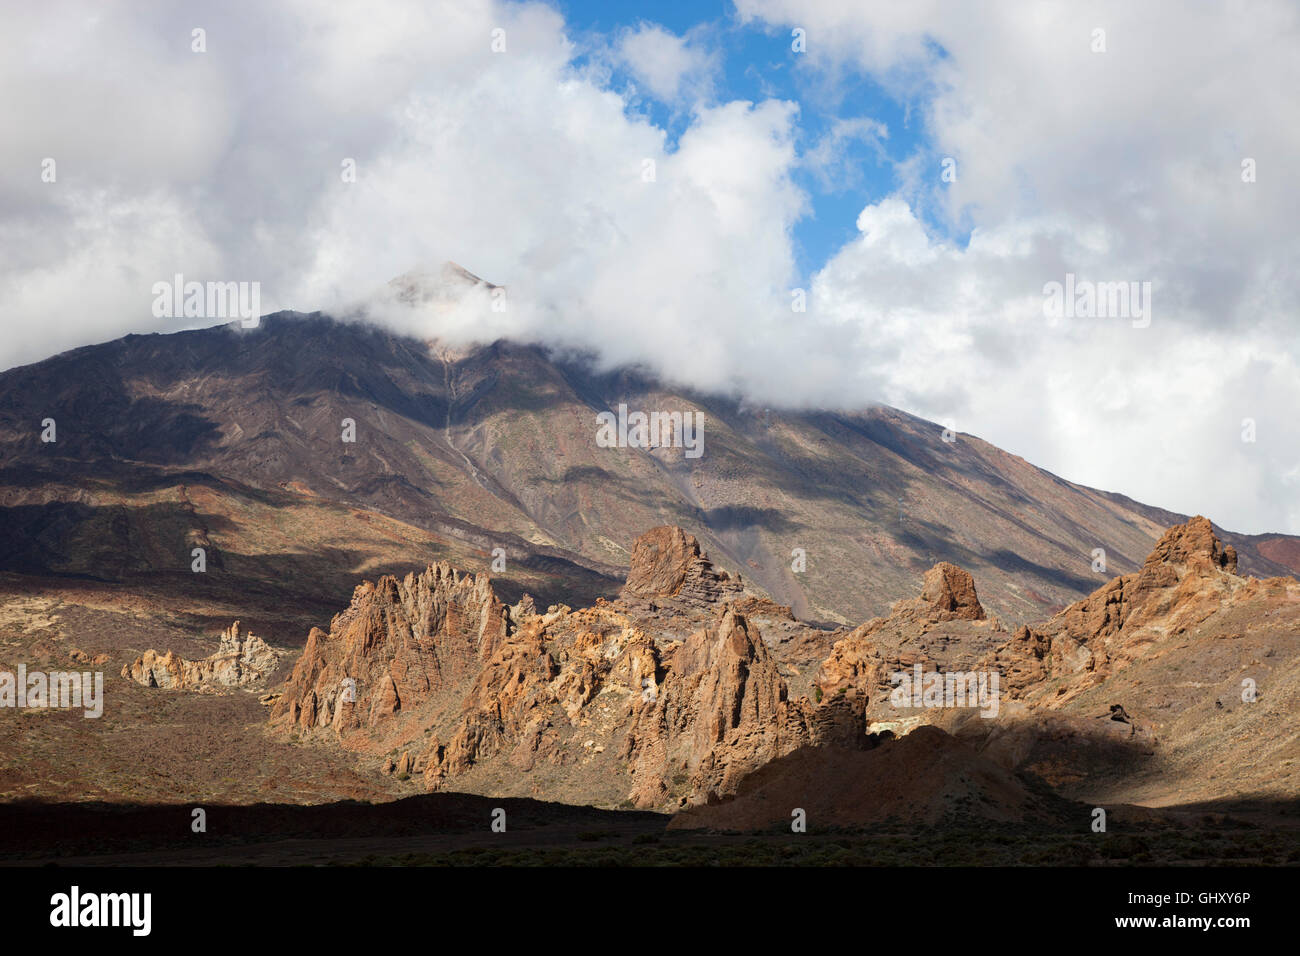 Los Roques, Llano de Ucanca and Teide volcano, Tenerife island, Canary archipelago, Spain, Europe - Stock Image